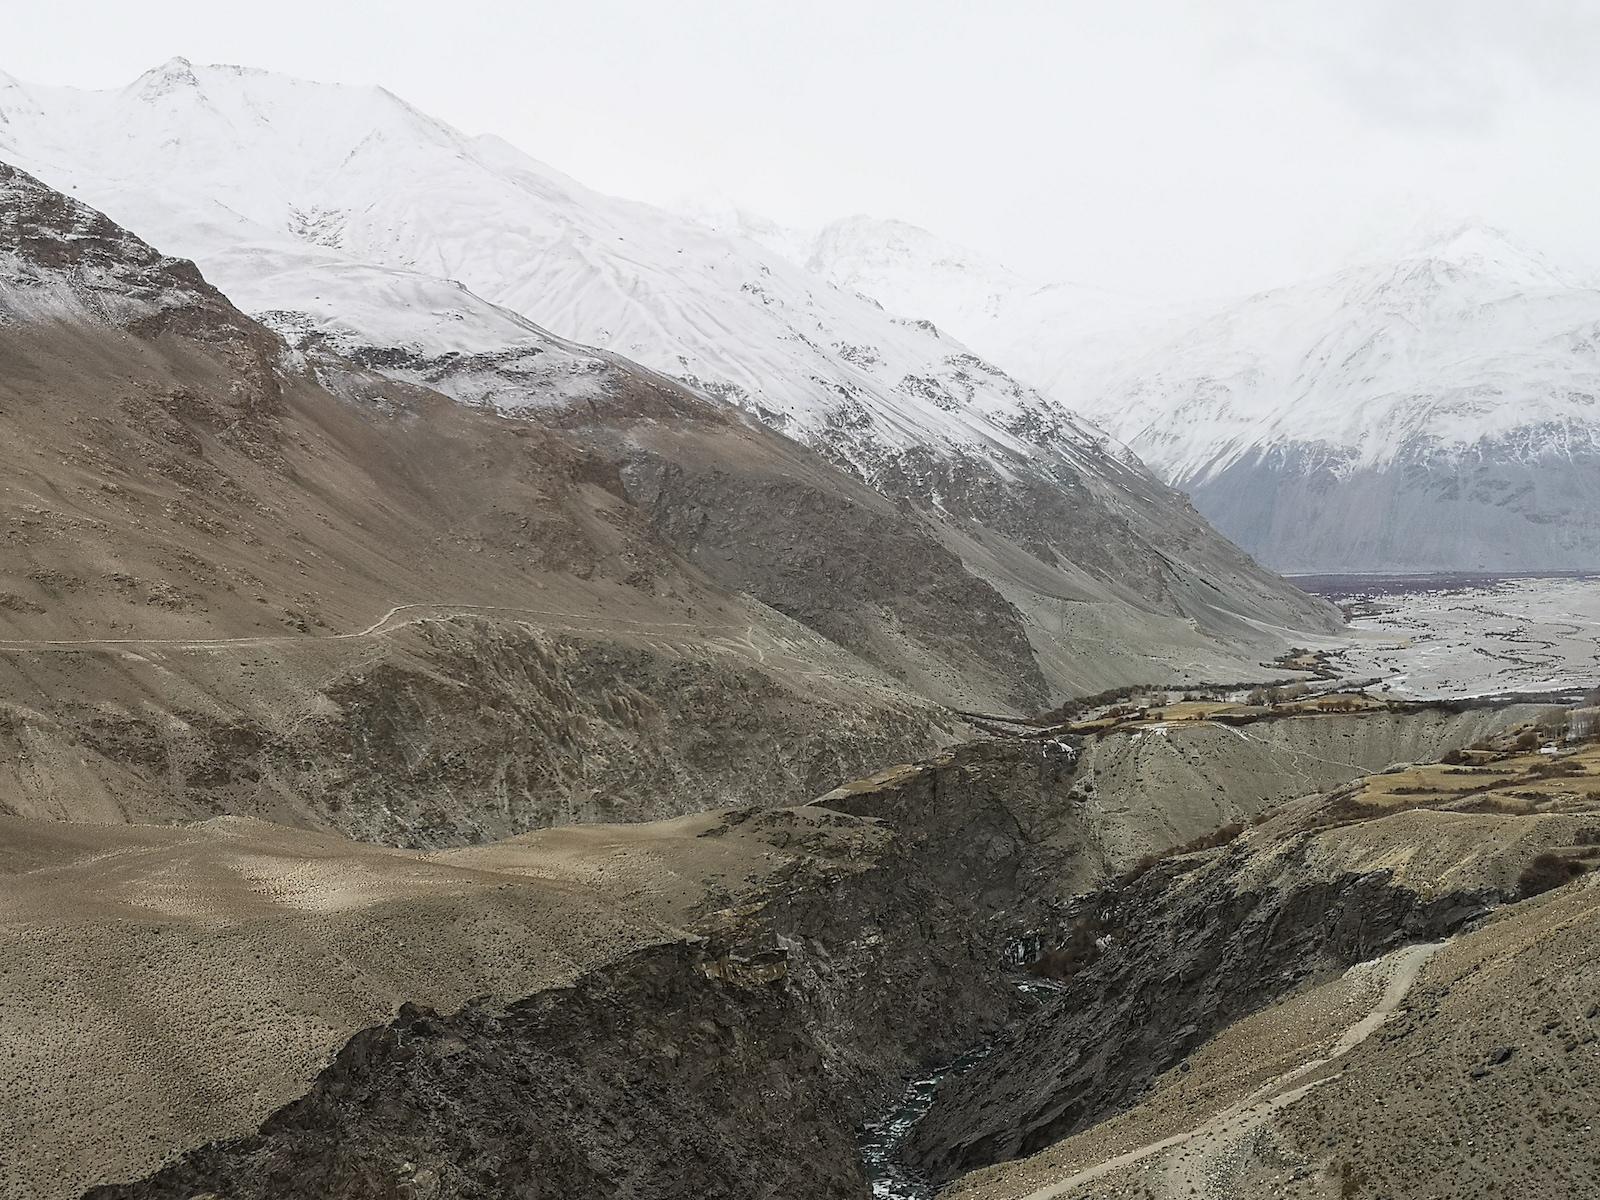 The Wakhan corridor in Afghanistan, seen from the Tajik side. Photo: Pepe Escobar, November 2019